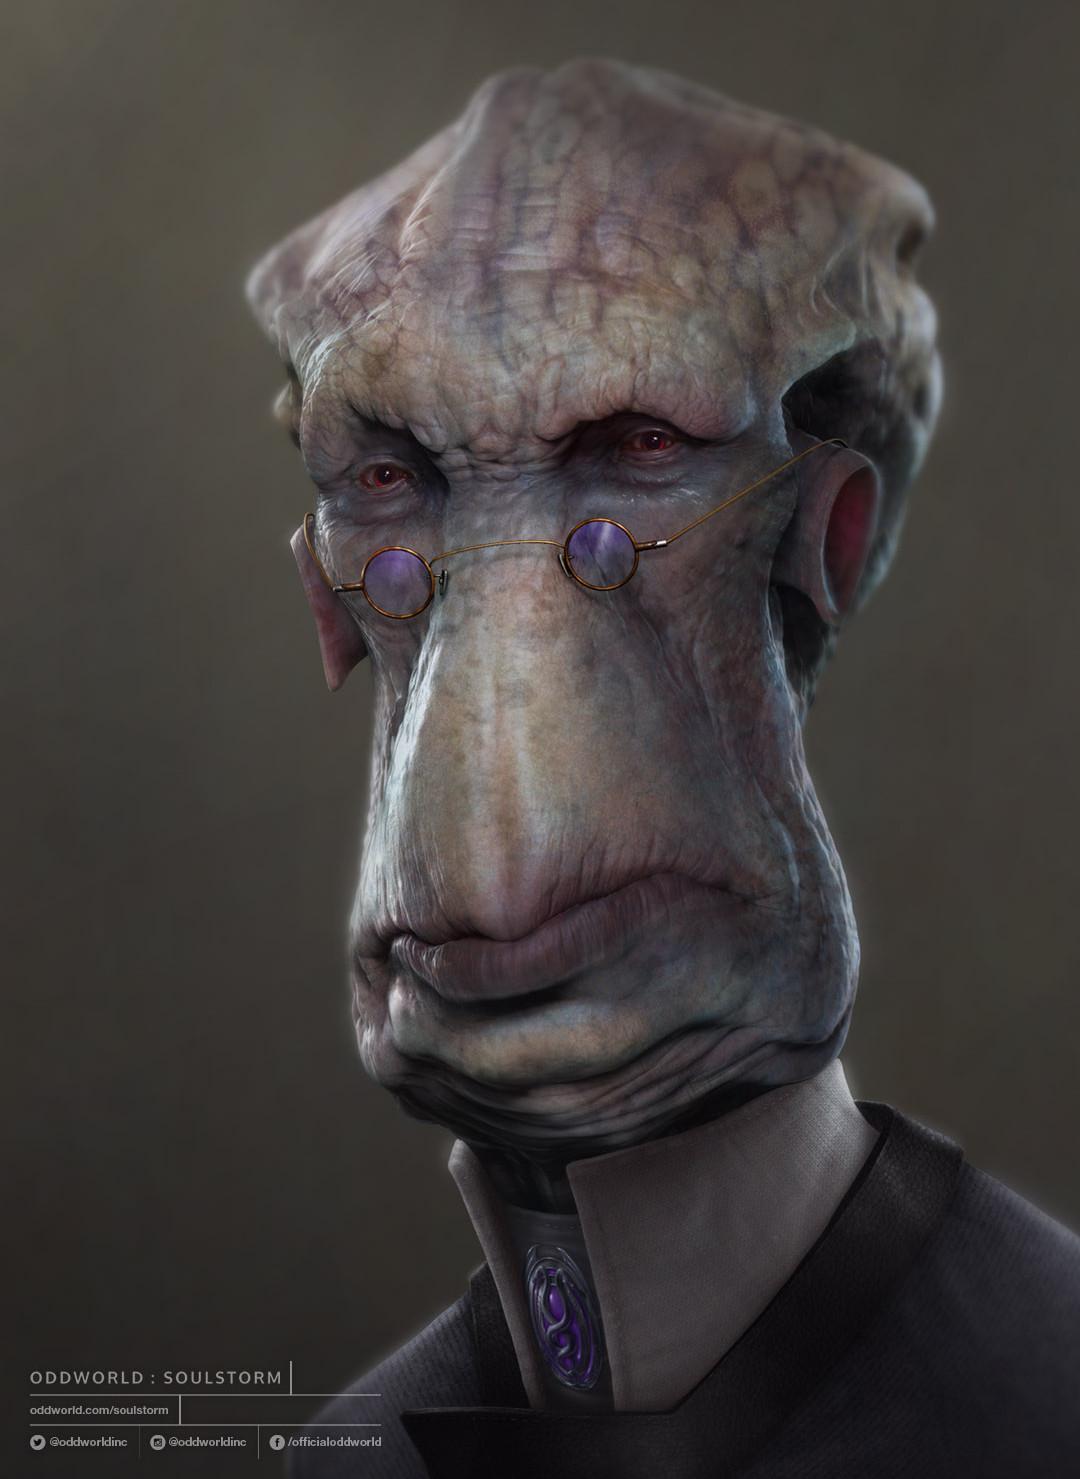 Oddworld Soulstorm character portraits, Glukkon 3